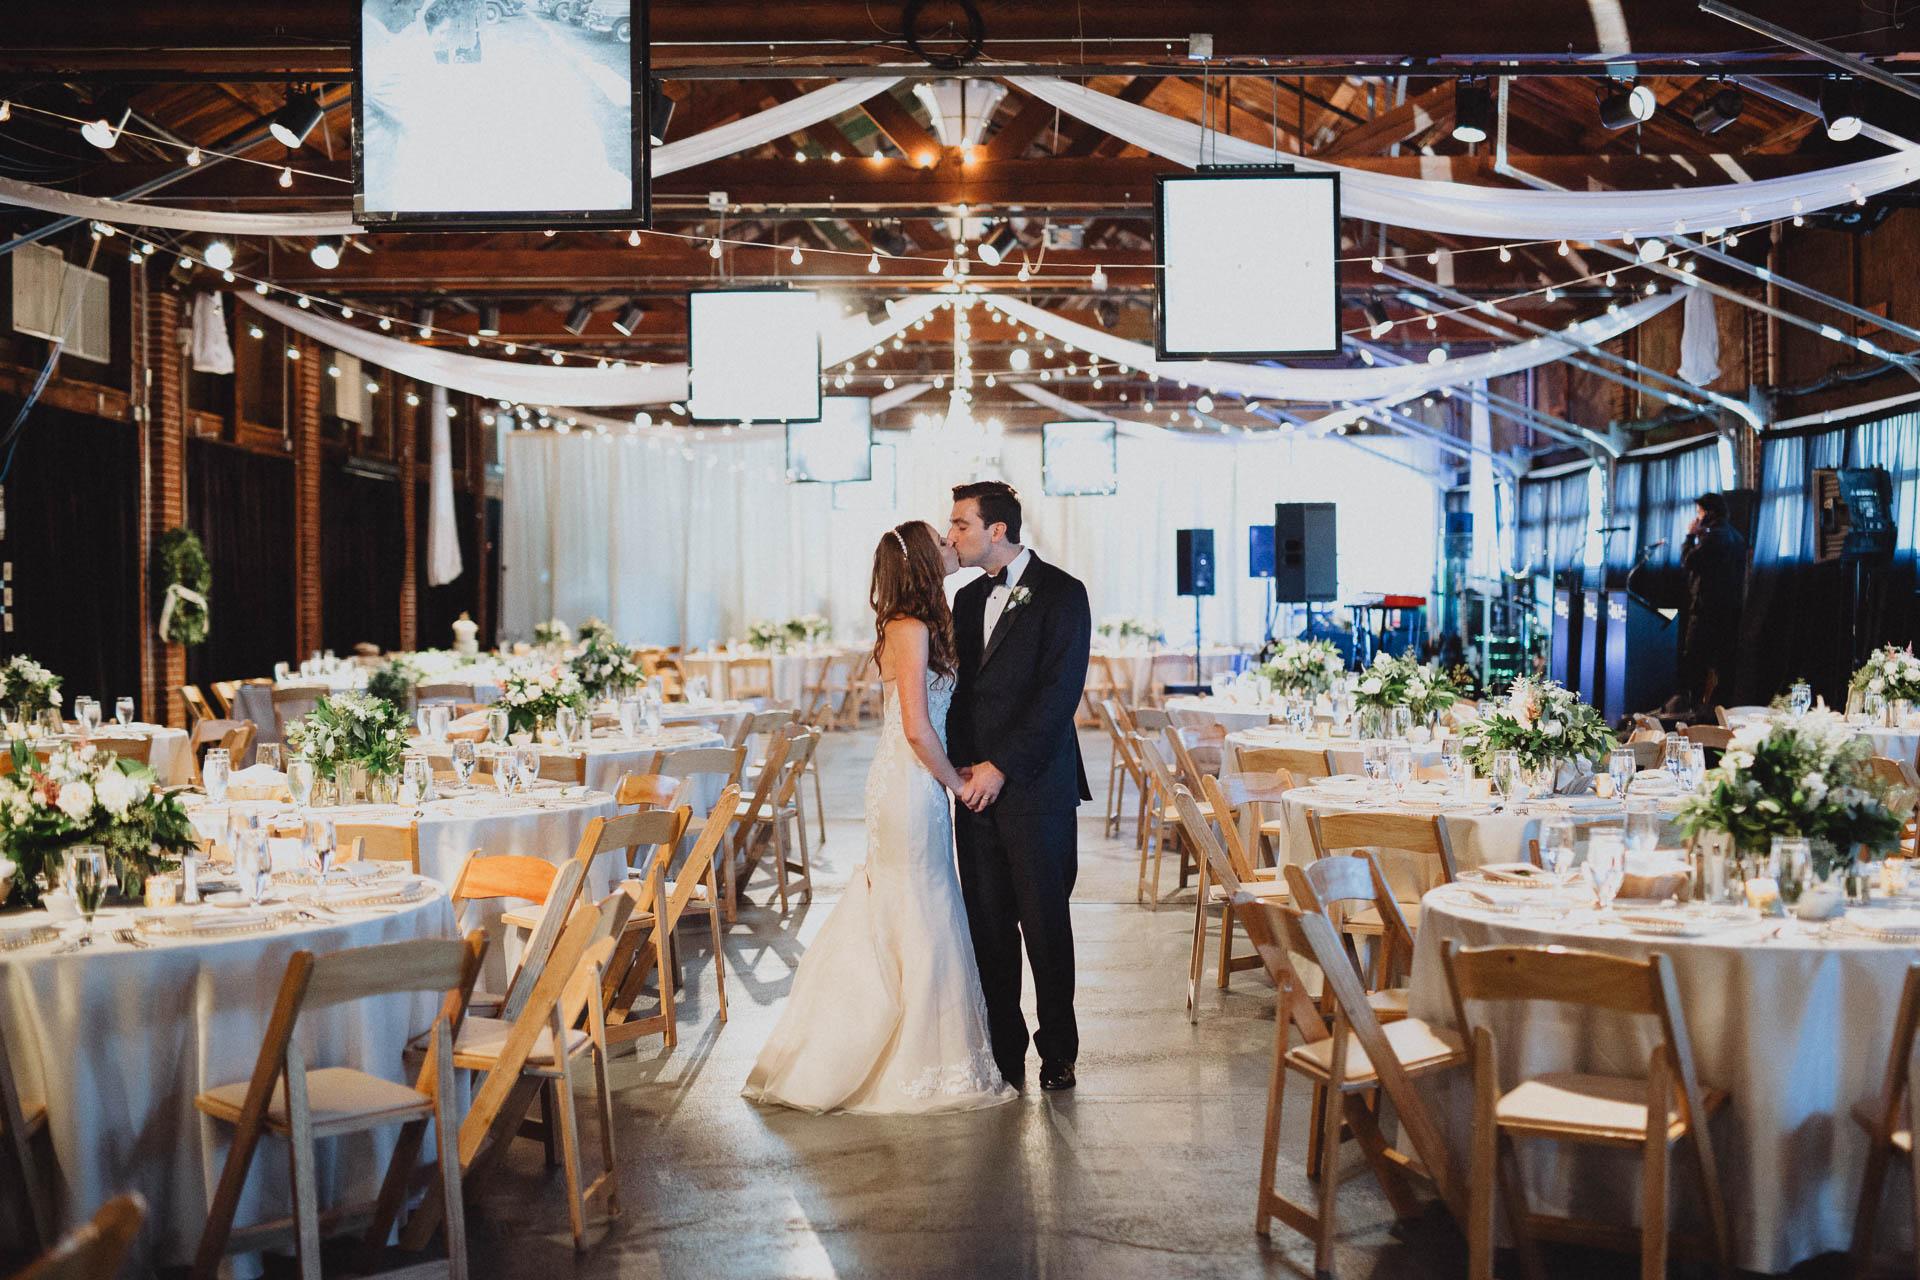 Keri-Joseph-Top-of-the-Market-Wedding-146@2x.jpg